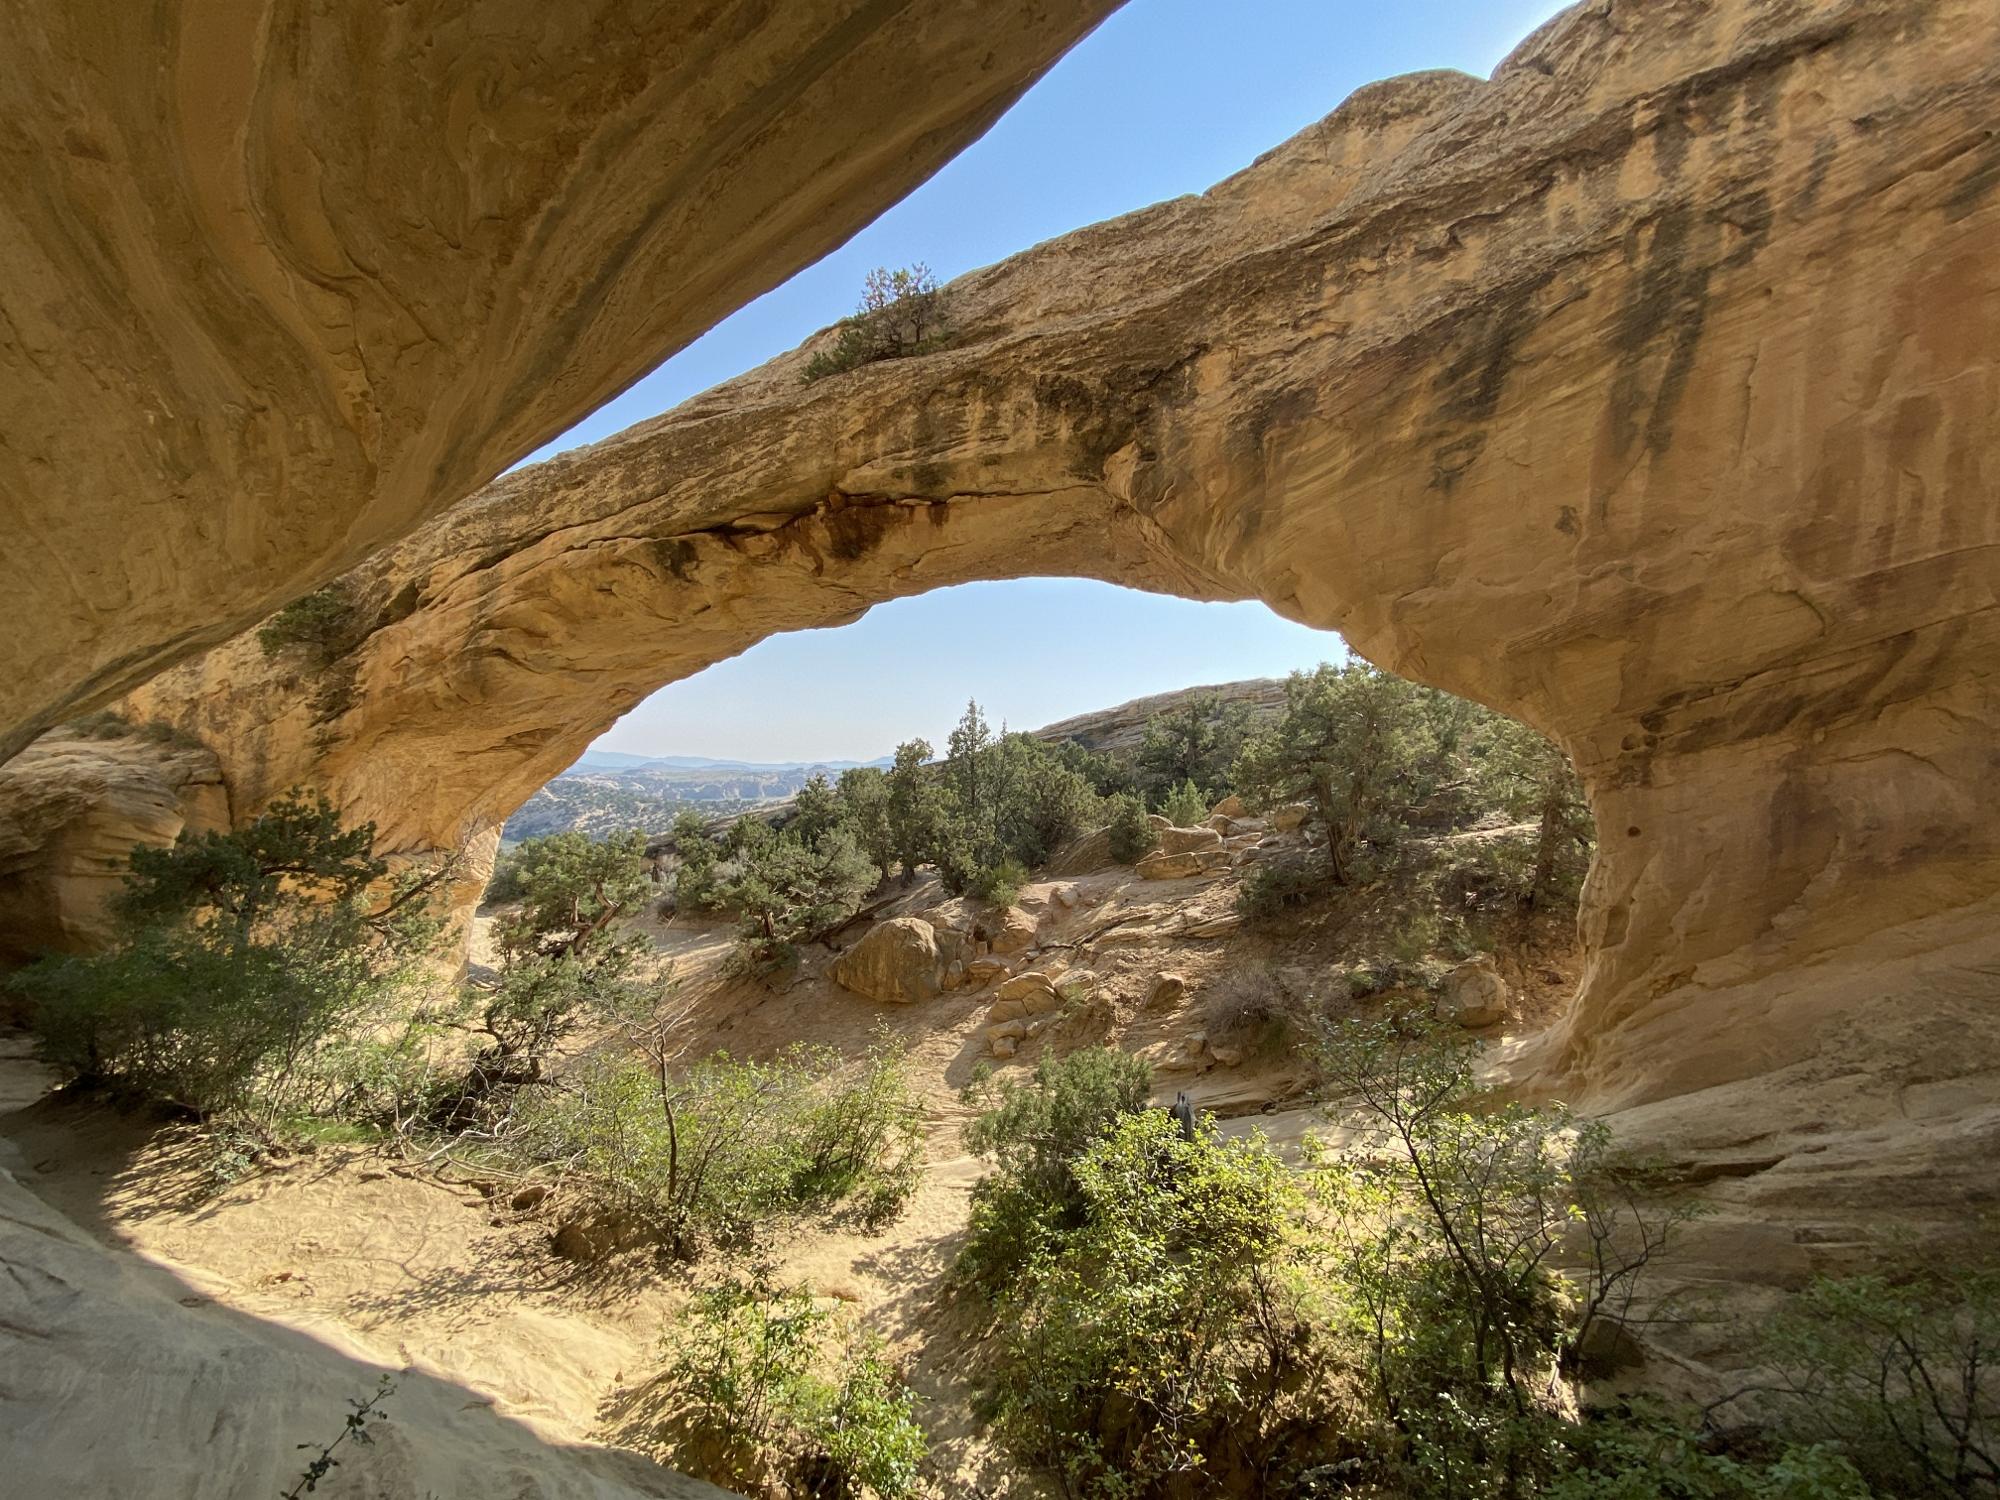 Moon Arch in Utah near Dinosaur National Monument